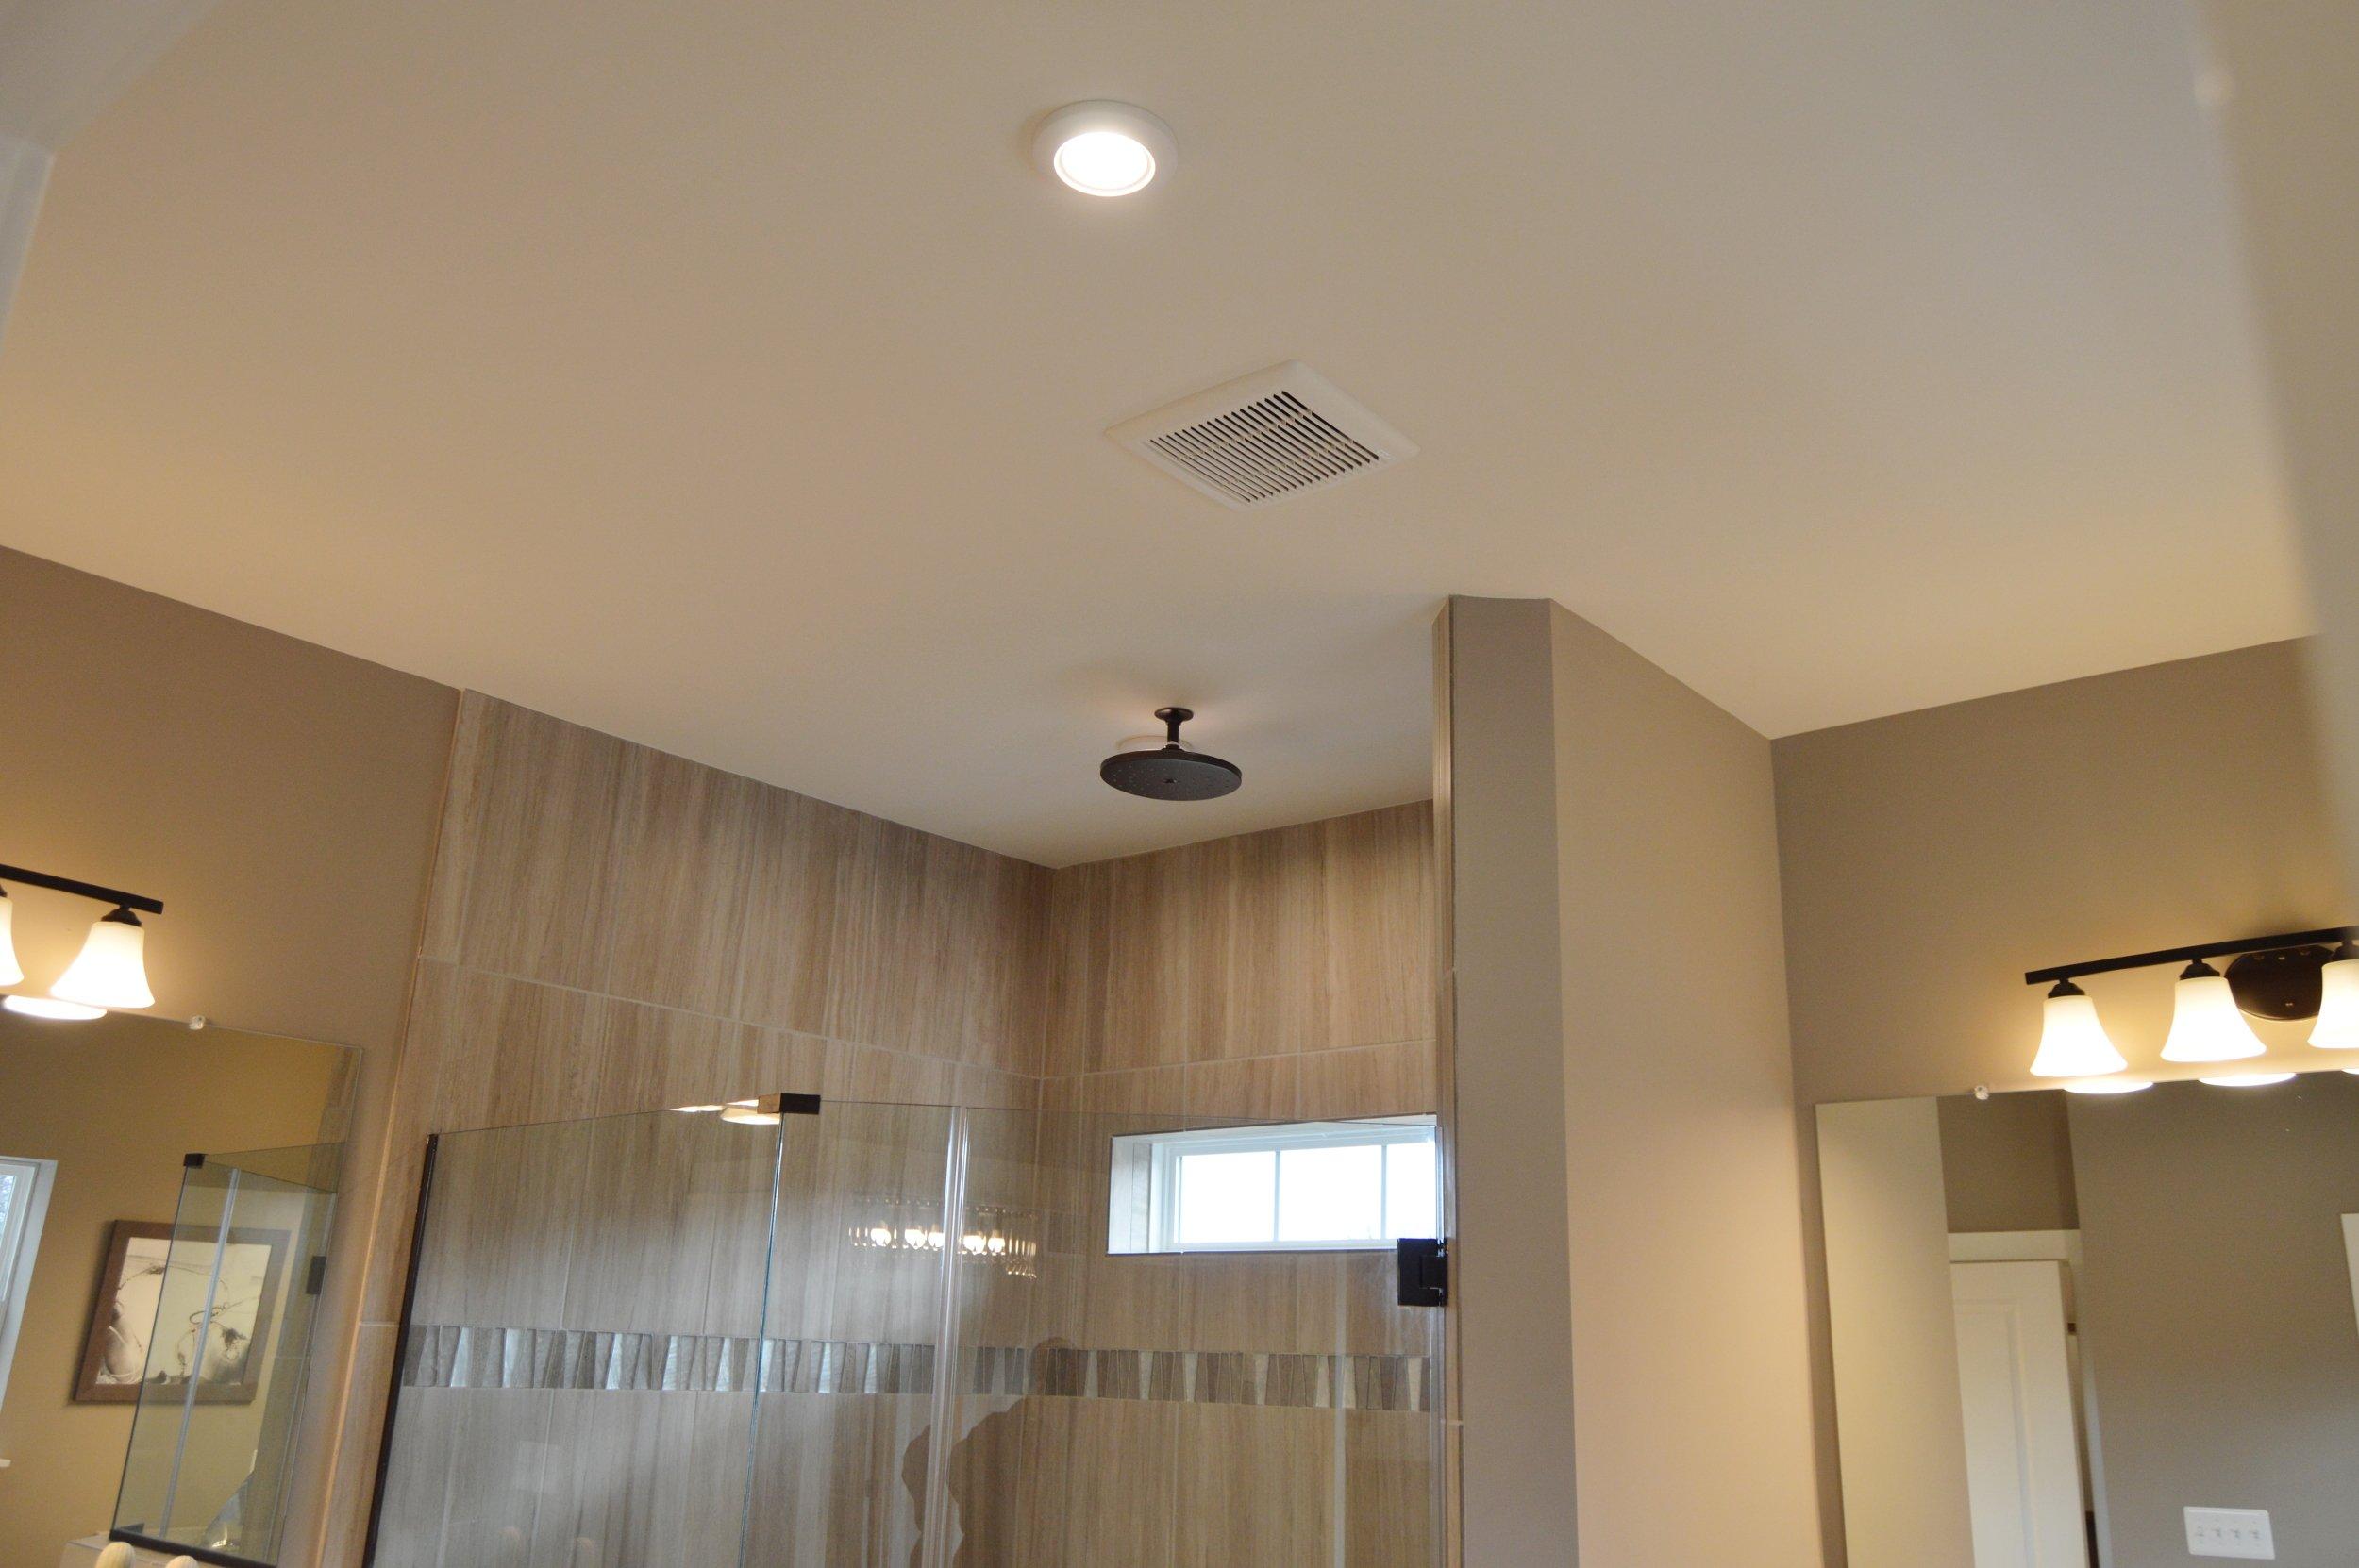 Crofton Electrician for Bathroom Remodel